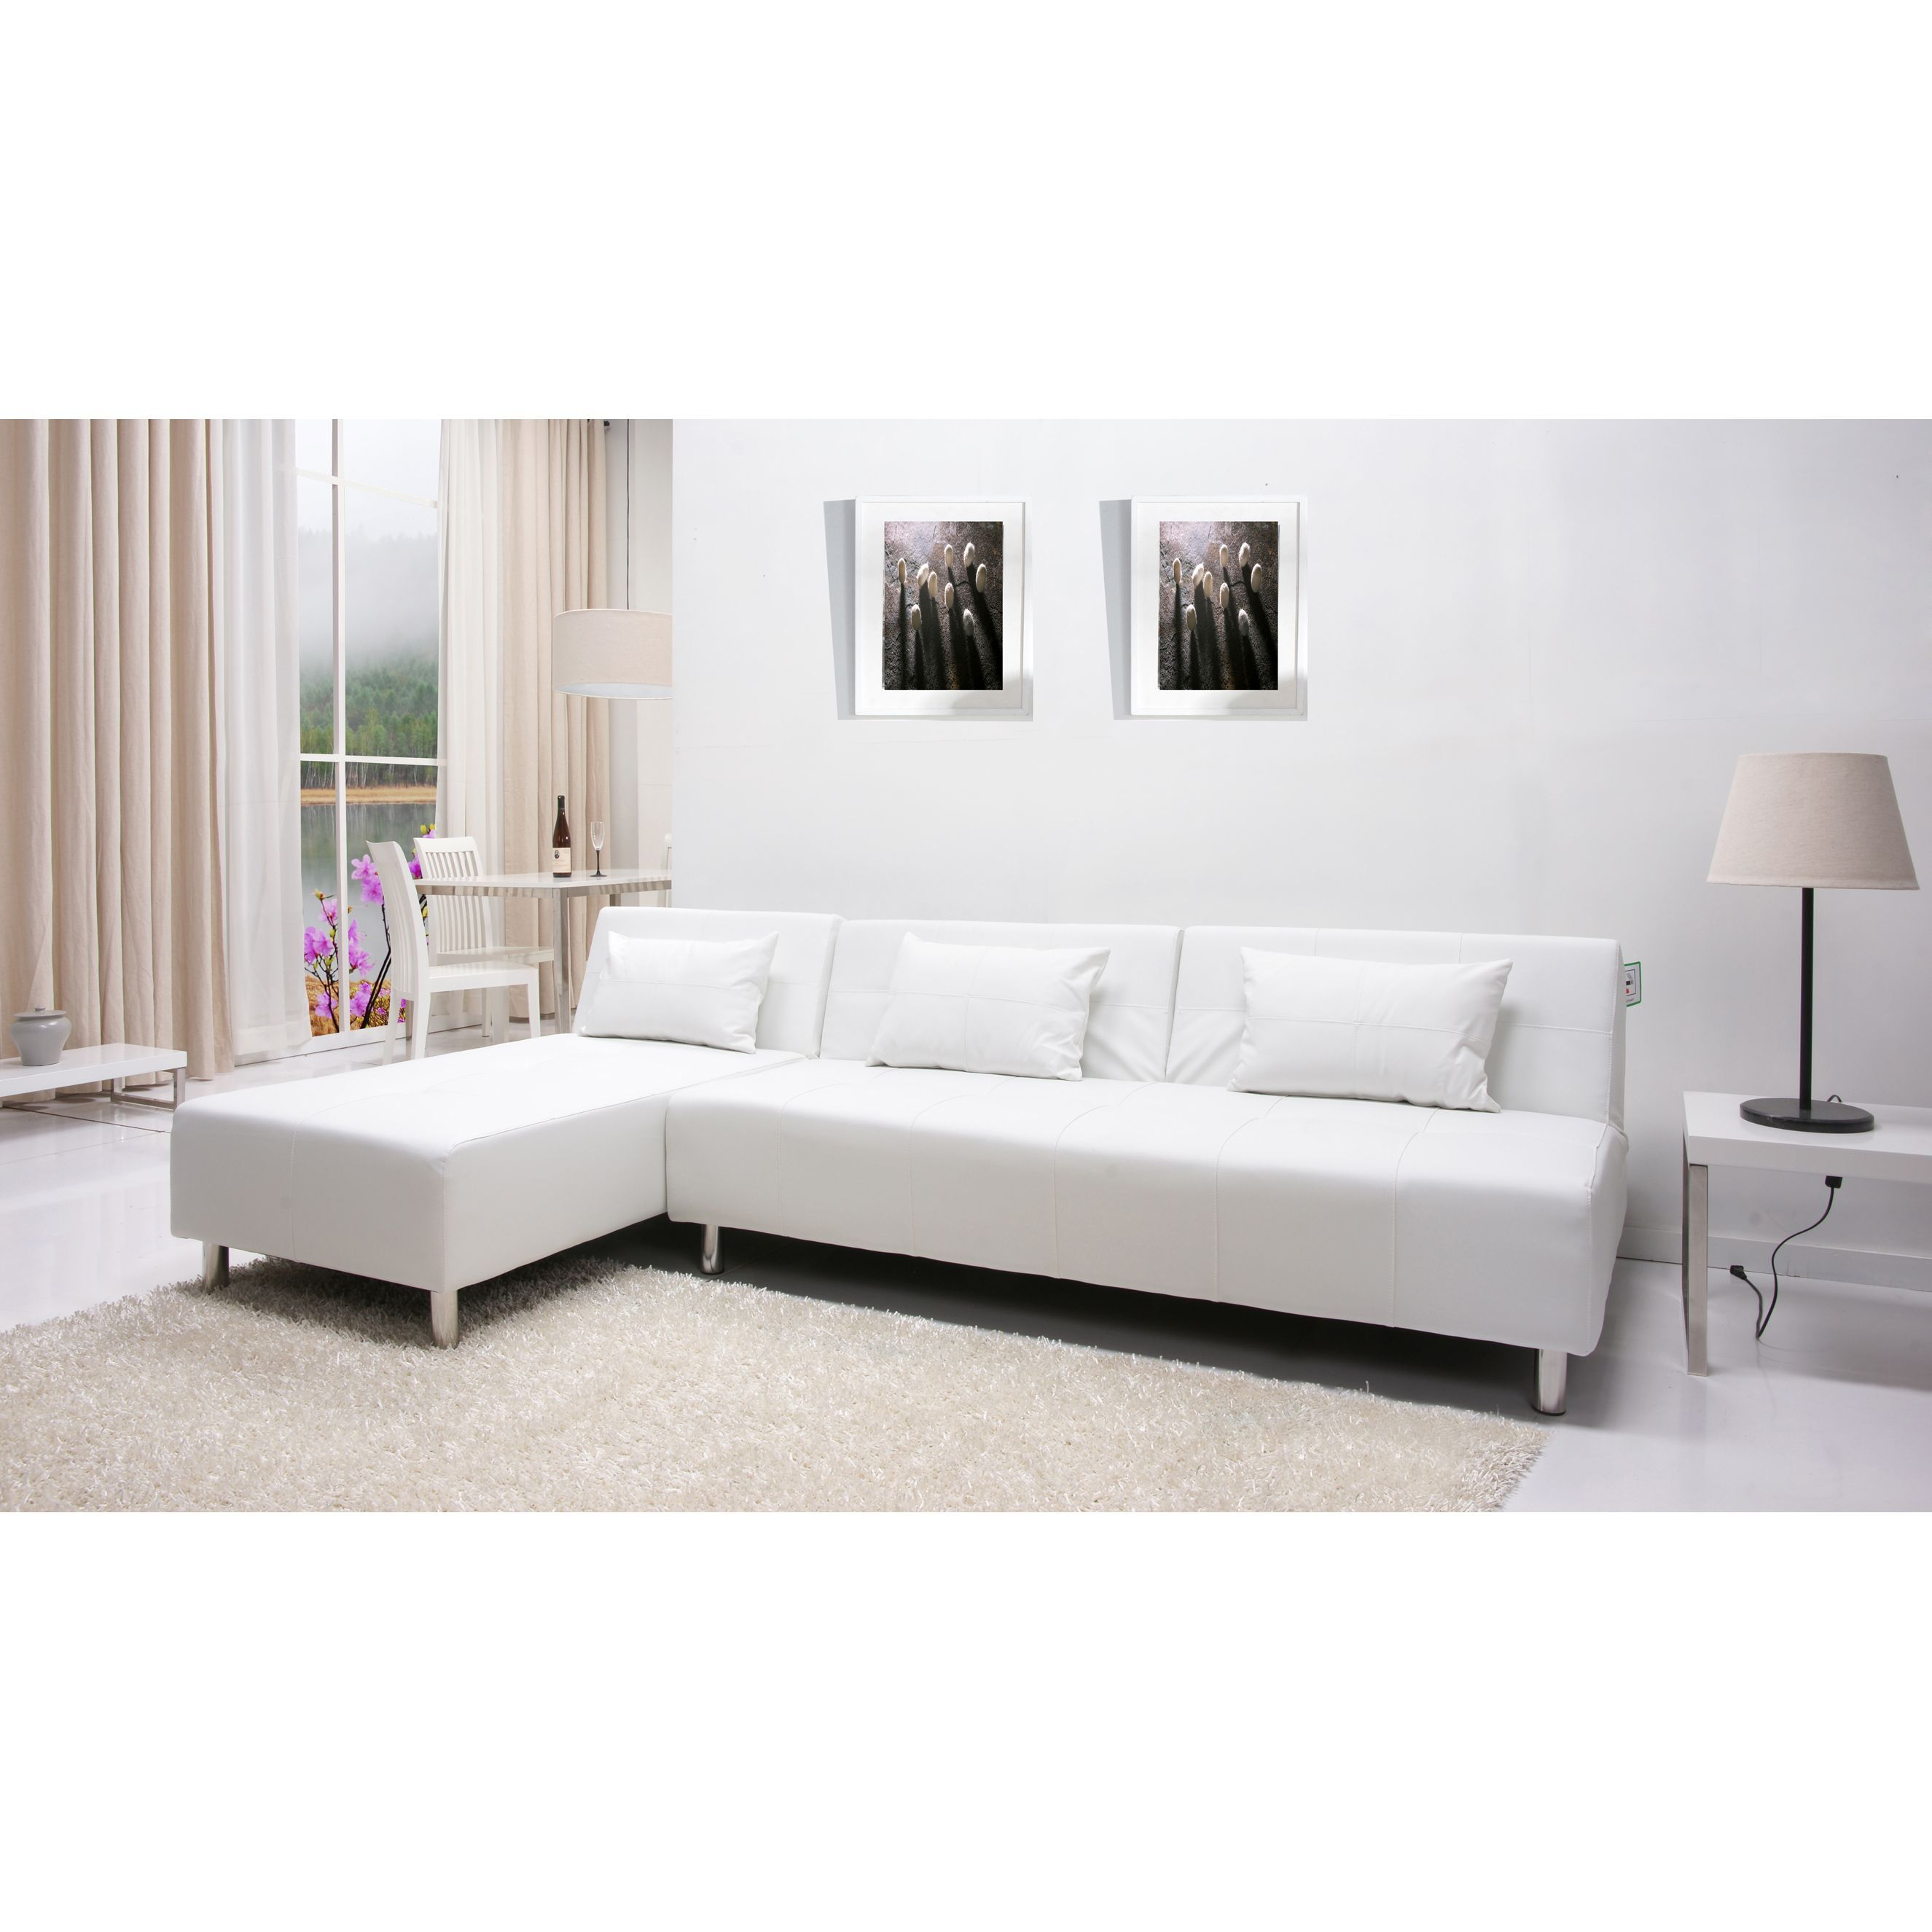 Gold Sparrow Atlanta White Convertible Sectional Sofa Bed